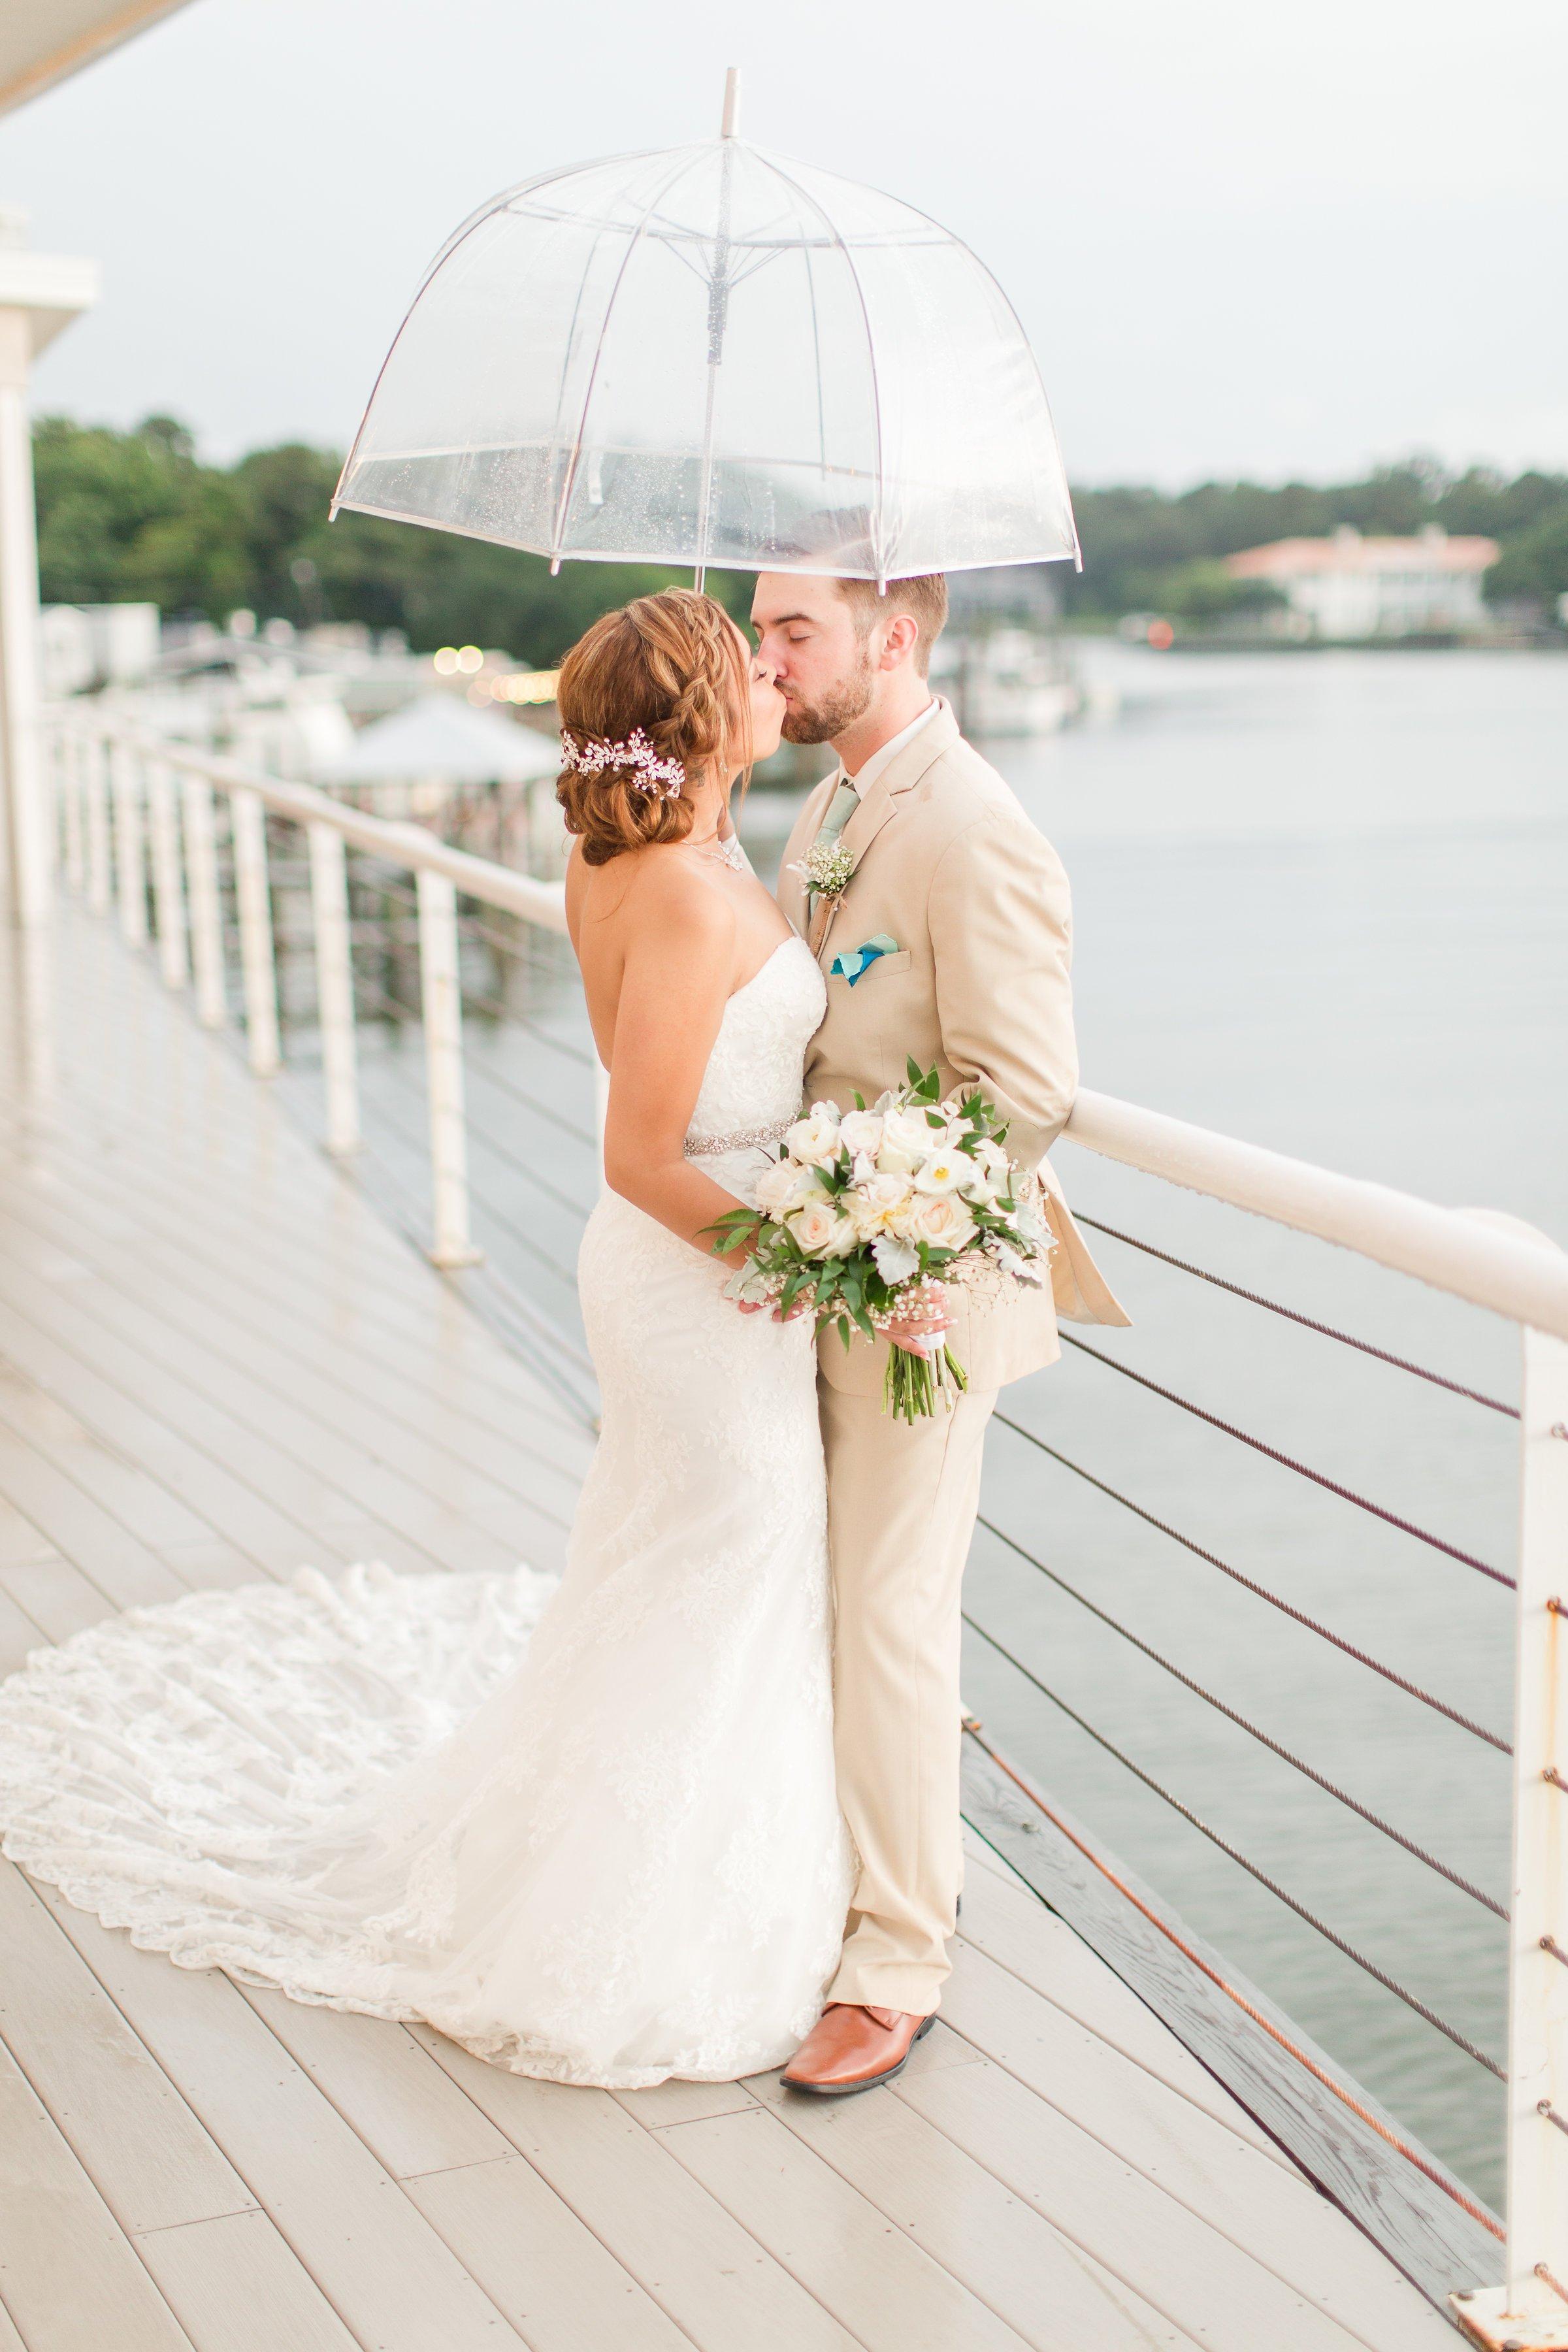 Budget Friendly Wedding Venue Virginia Beach Lesner Inn (1)